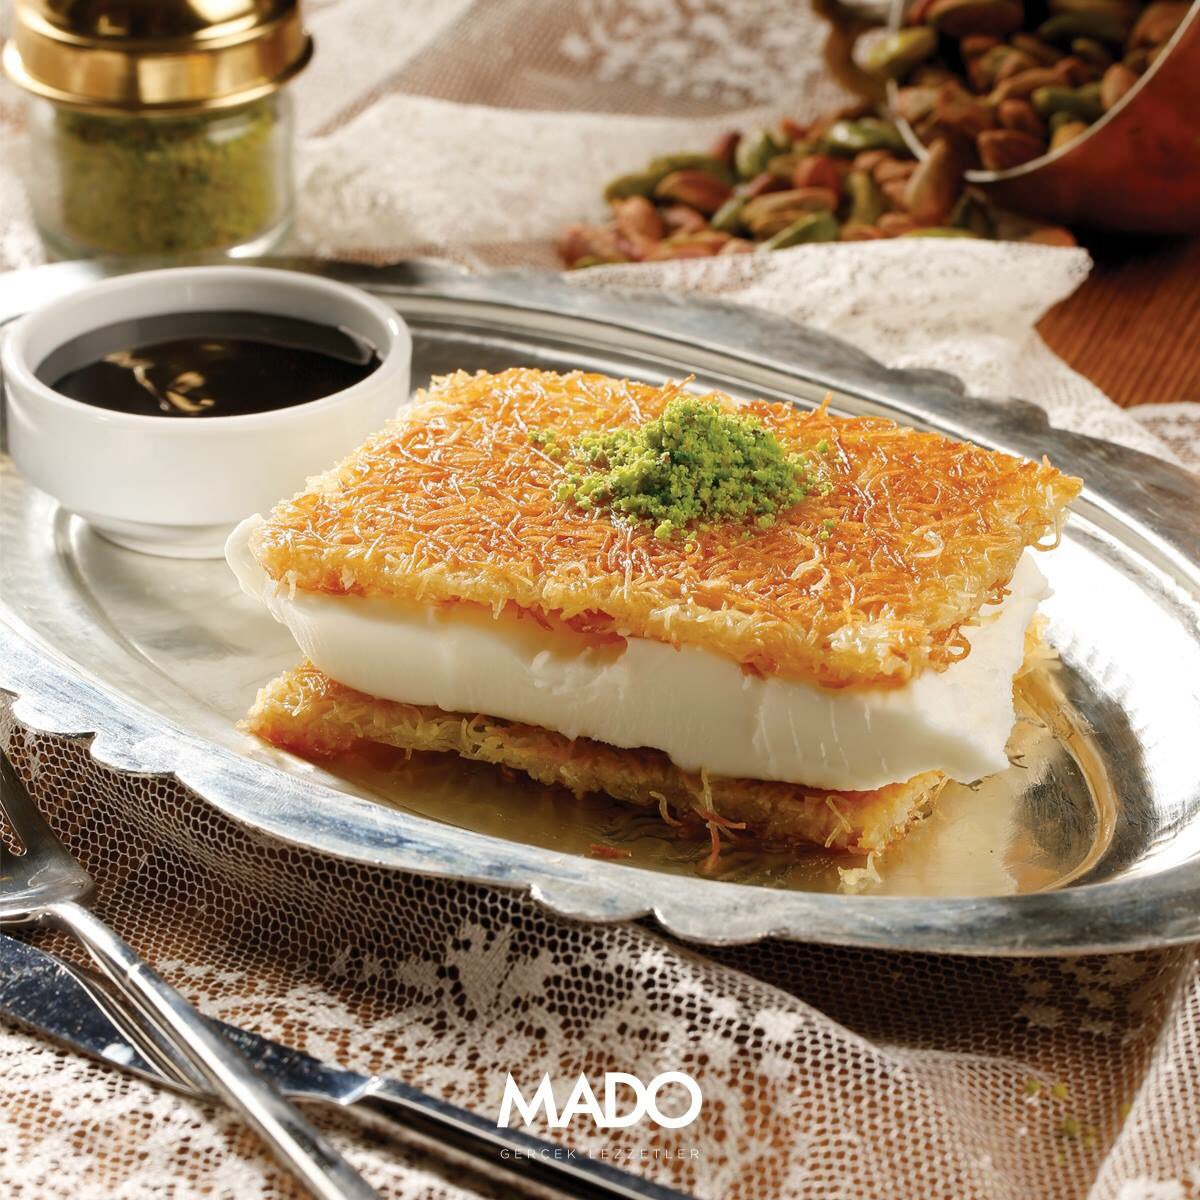 CpwnVRYWAAAi8Qe - Τουρκική αλυσίδα ζαχαροπλαστείων έρχεται στη Λάρισα!